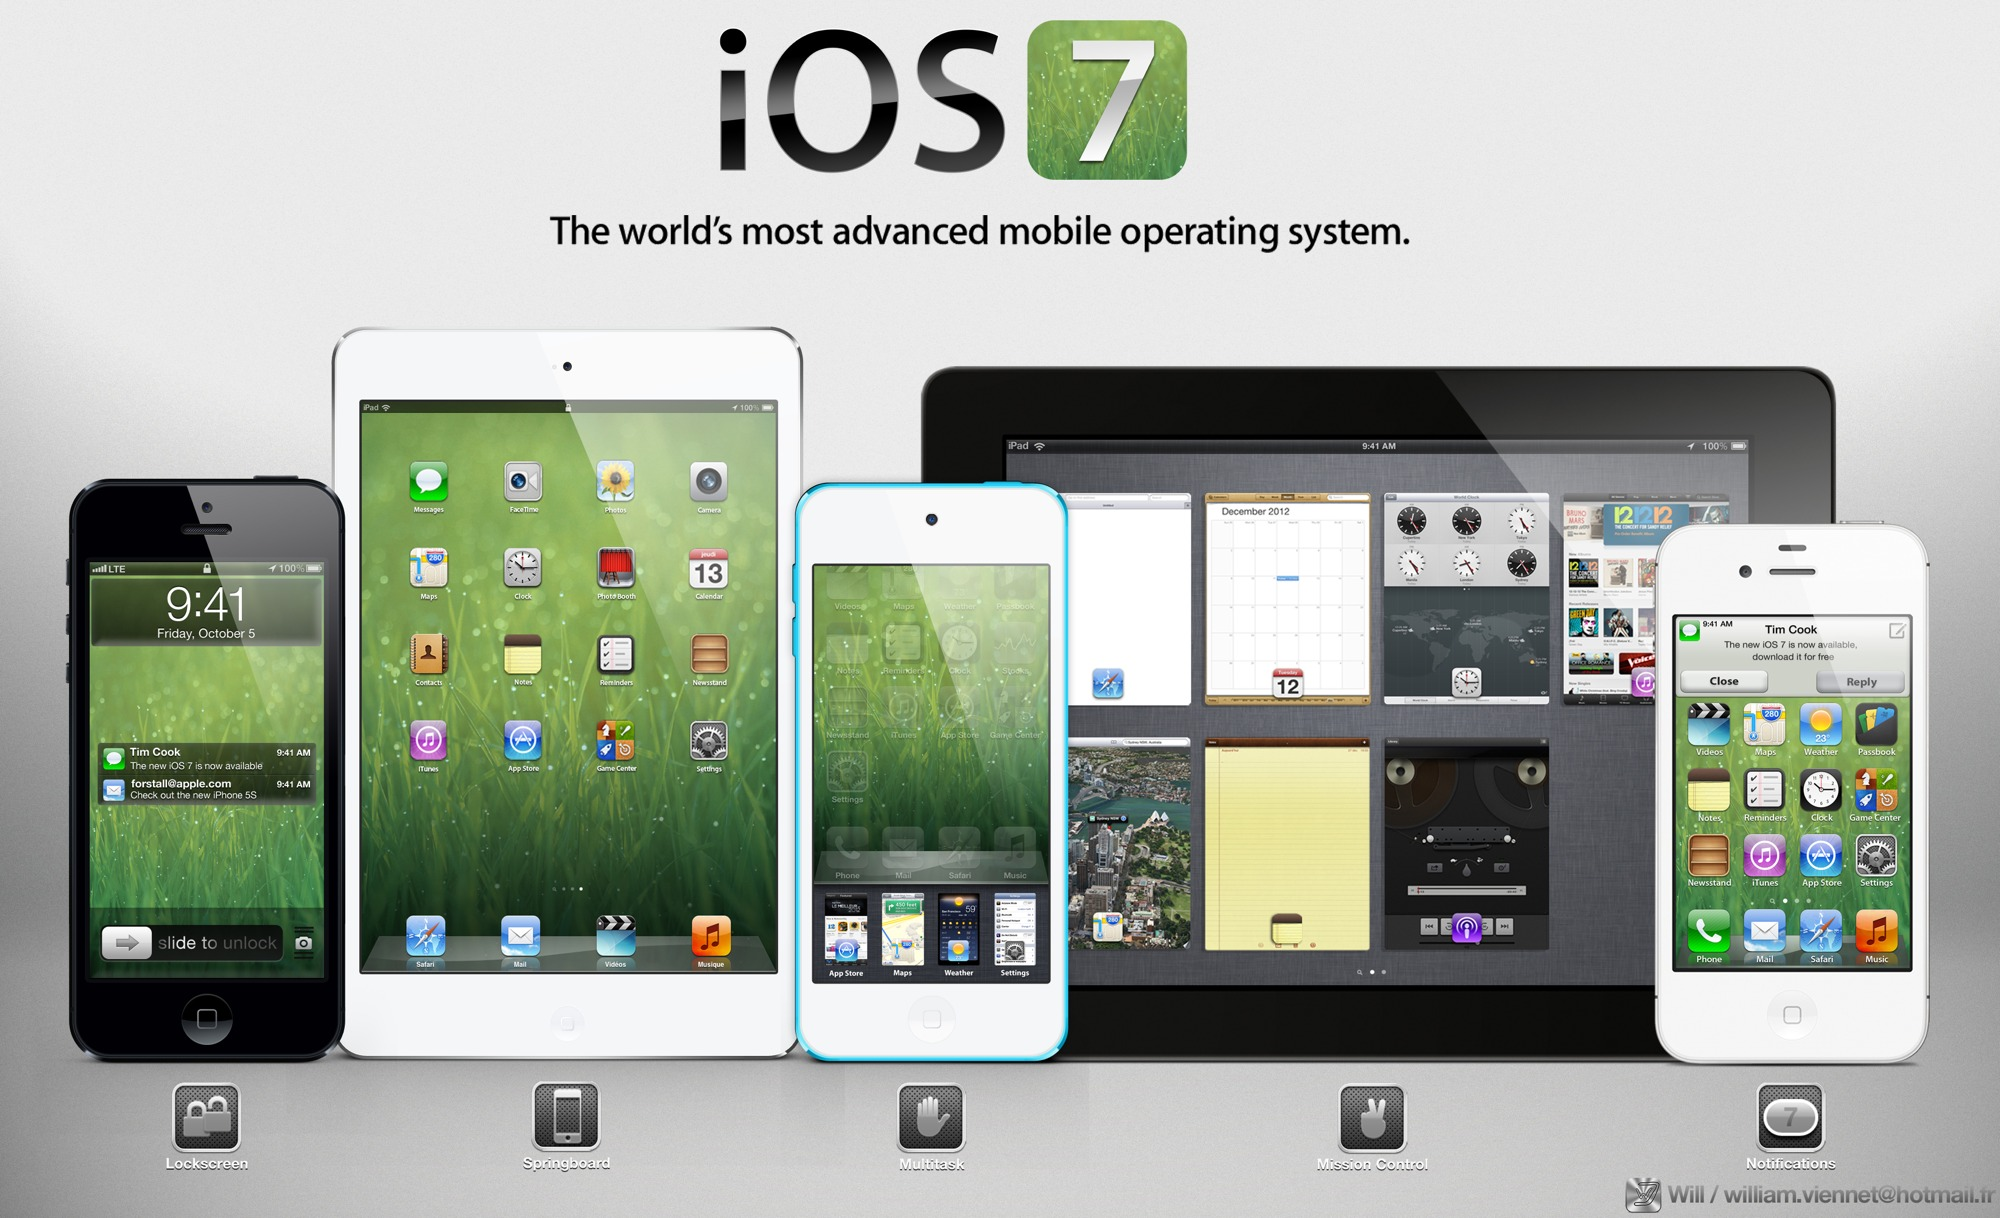 iOS 7은 머리의 움직임으로도 조절 가능하다는군요.